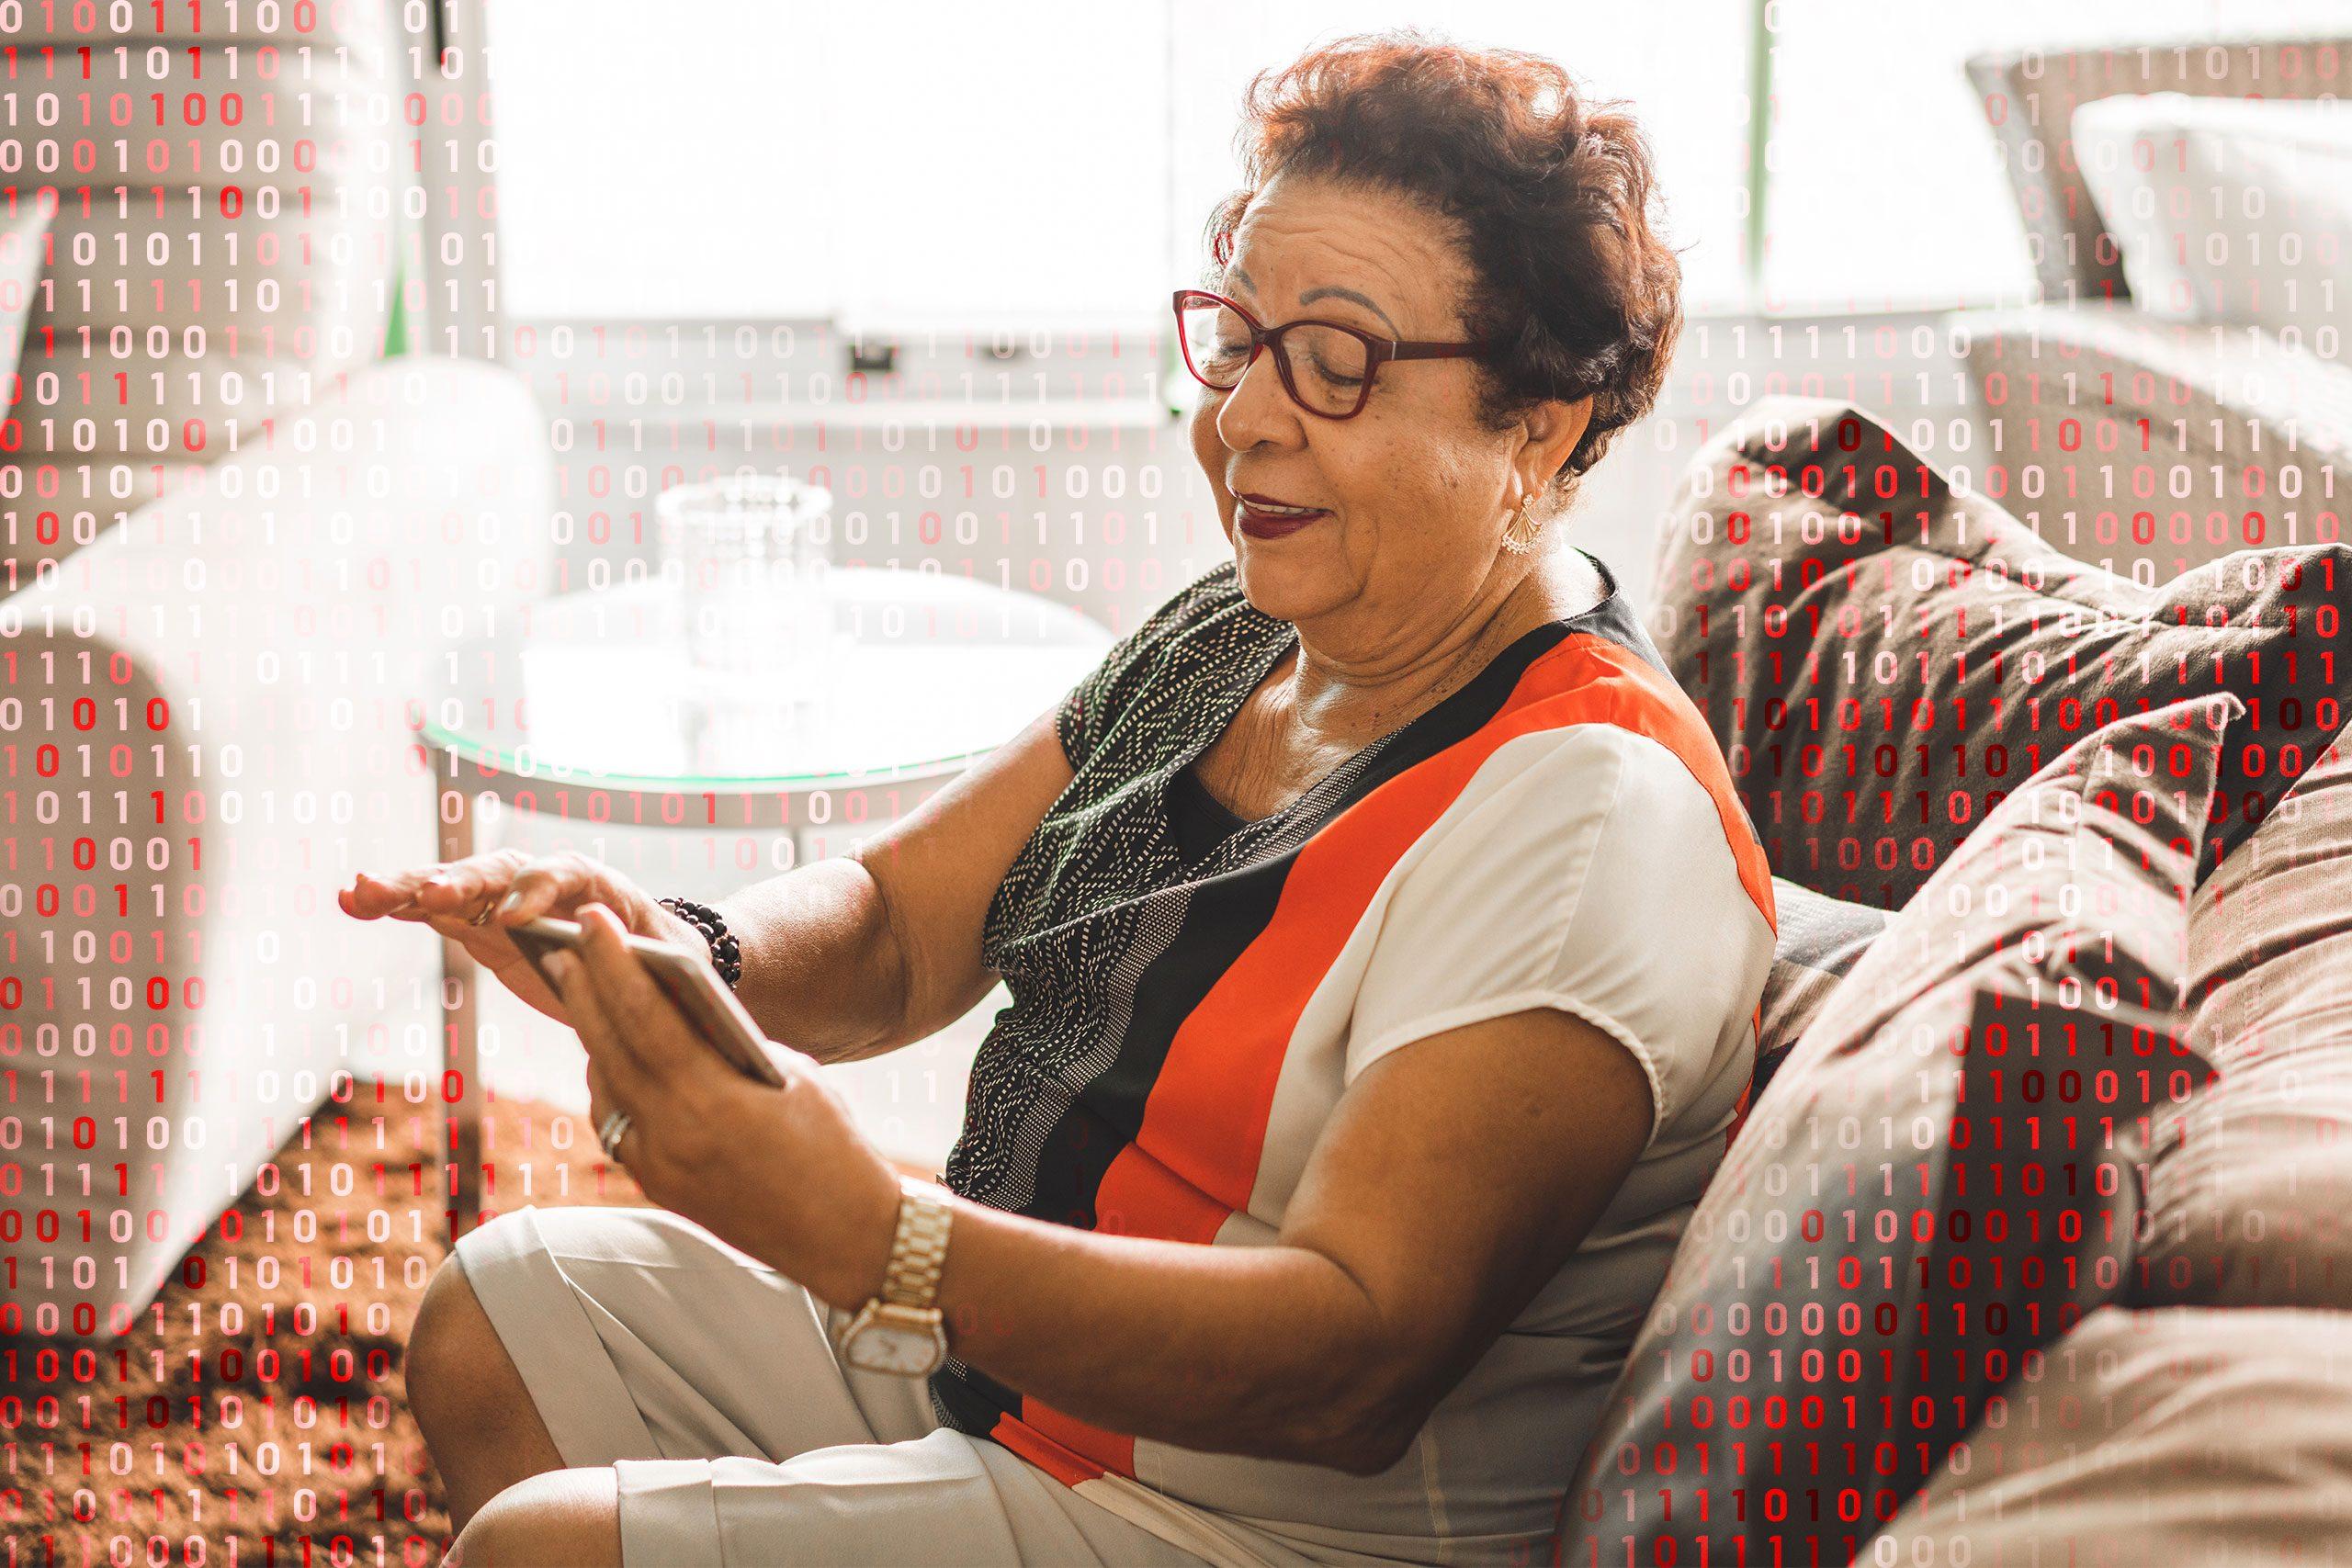 woman using zoom; computer code overlay